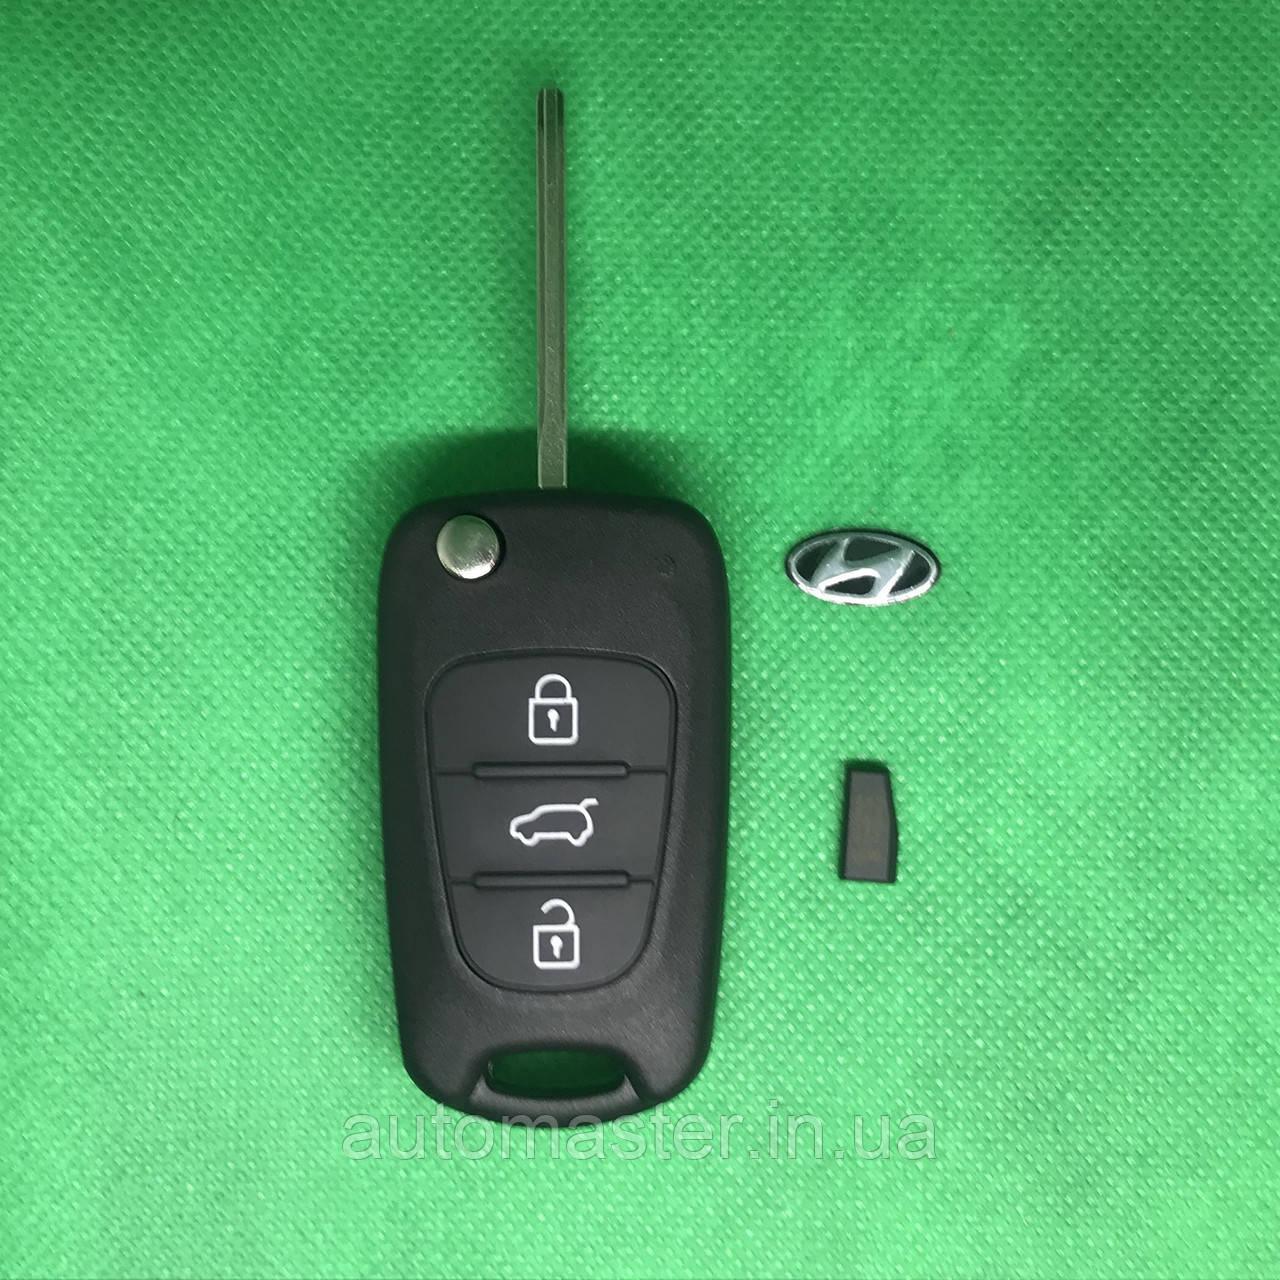 Выкидной ключ Hyundai (Хундай) ix35, i30,Sonata,Elantra, Akcent 3-кнопки, 433 Mhz ID 46